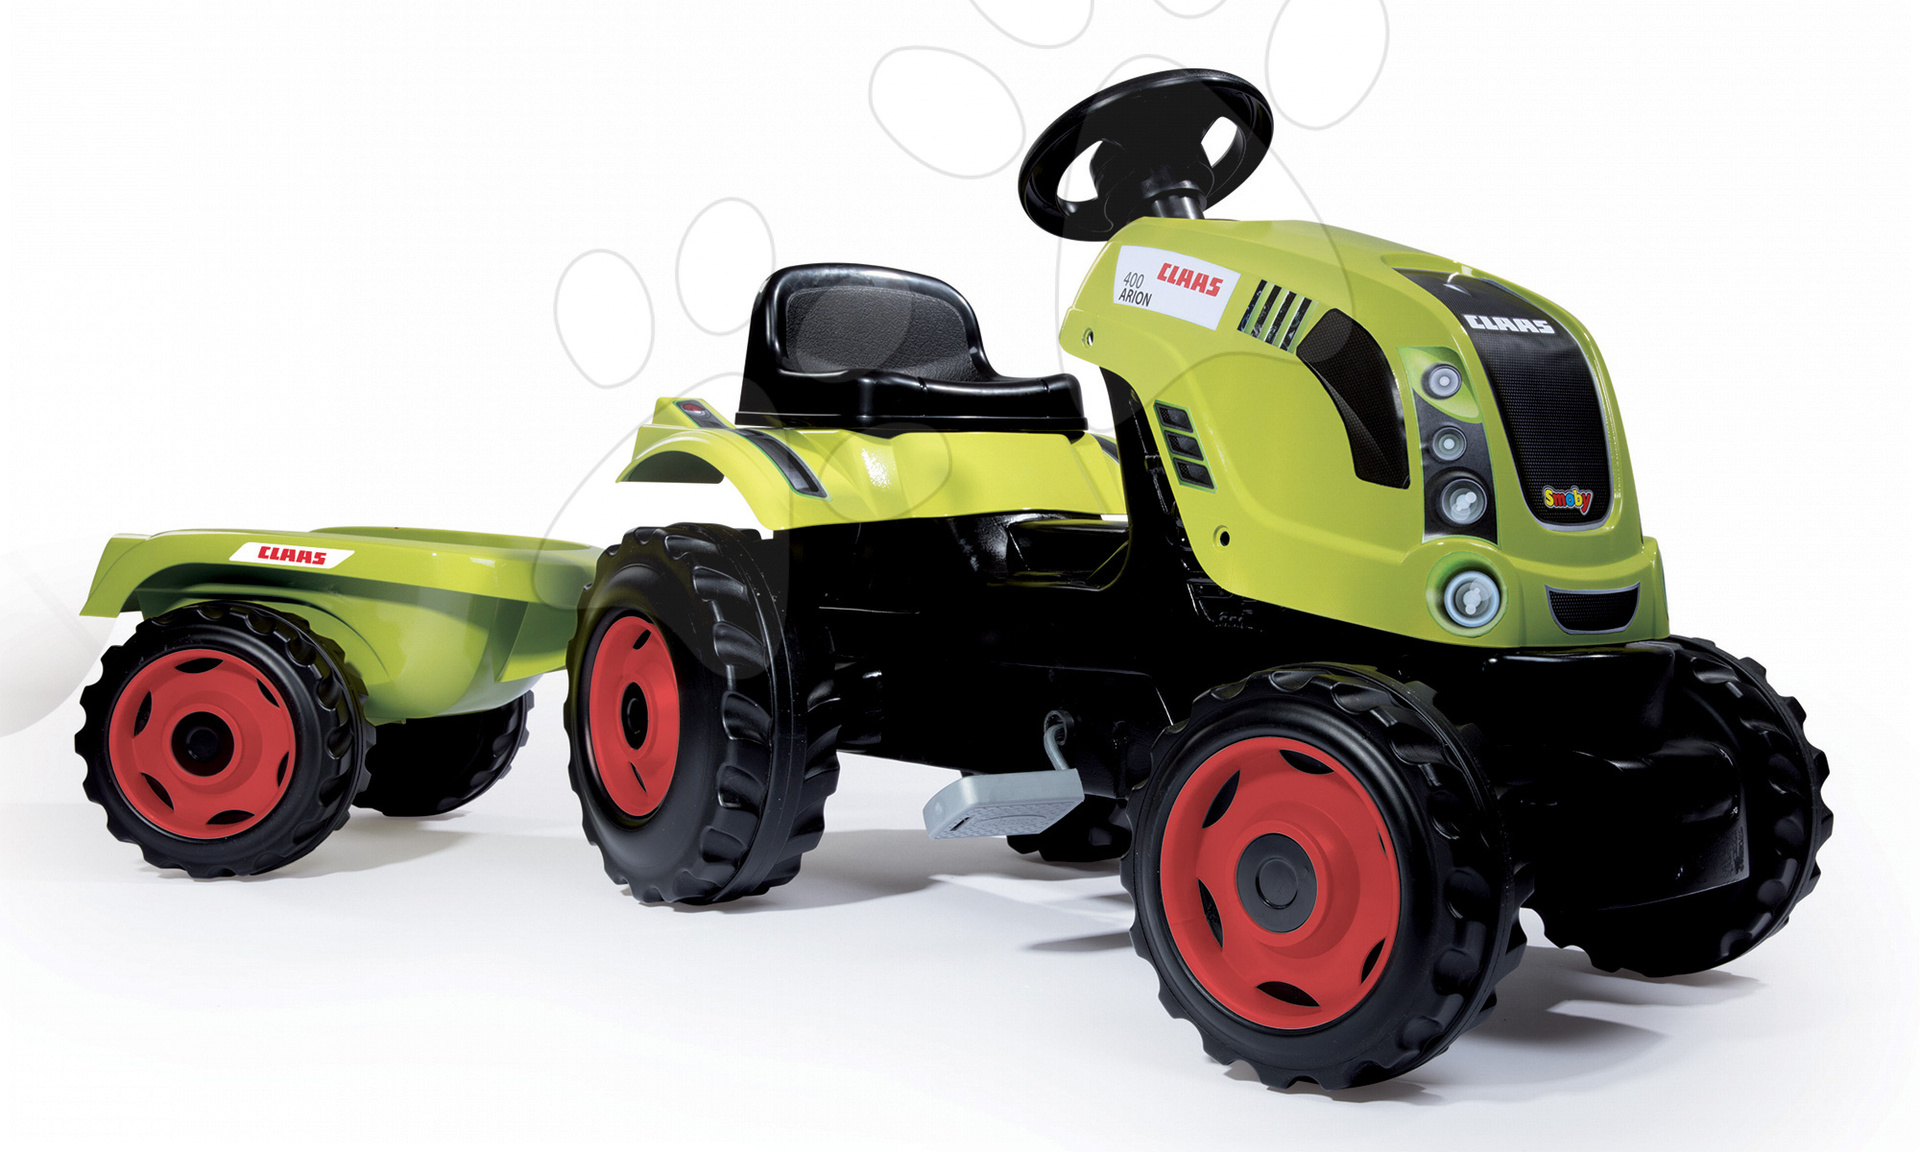 Tractor cu pedale Claas Fermier XL Smoby cu remorcă verde